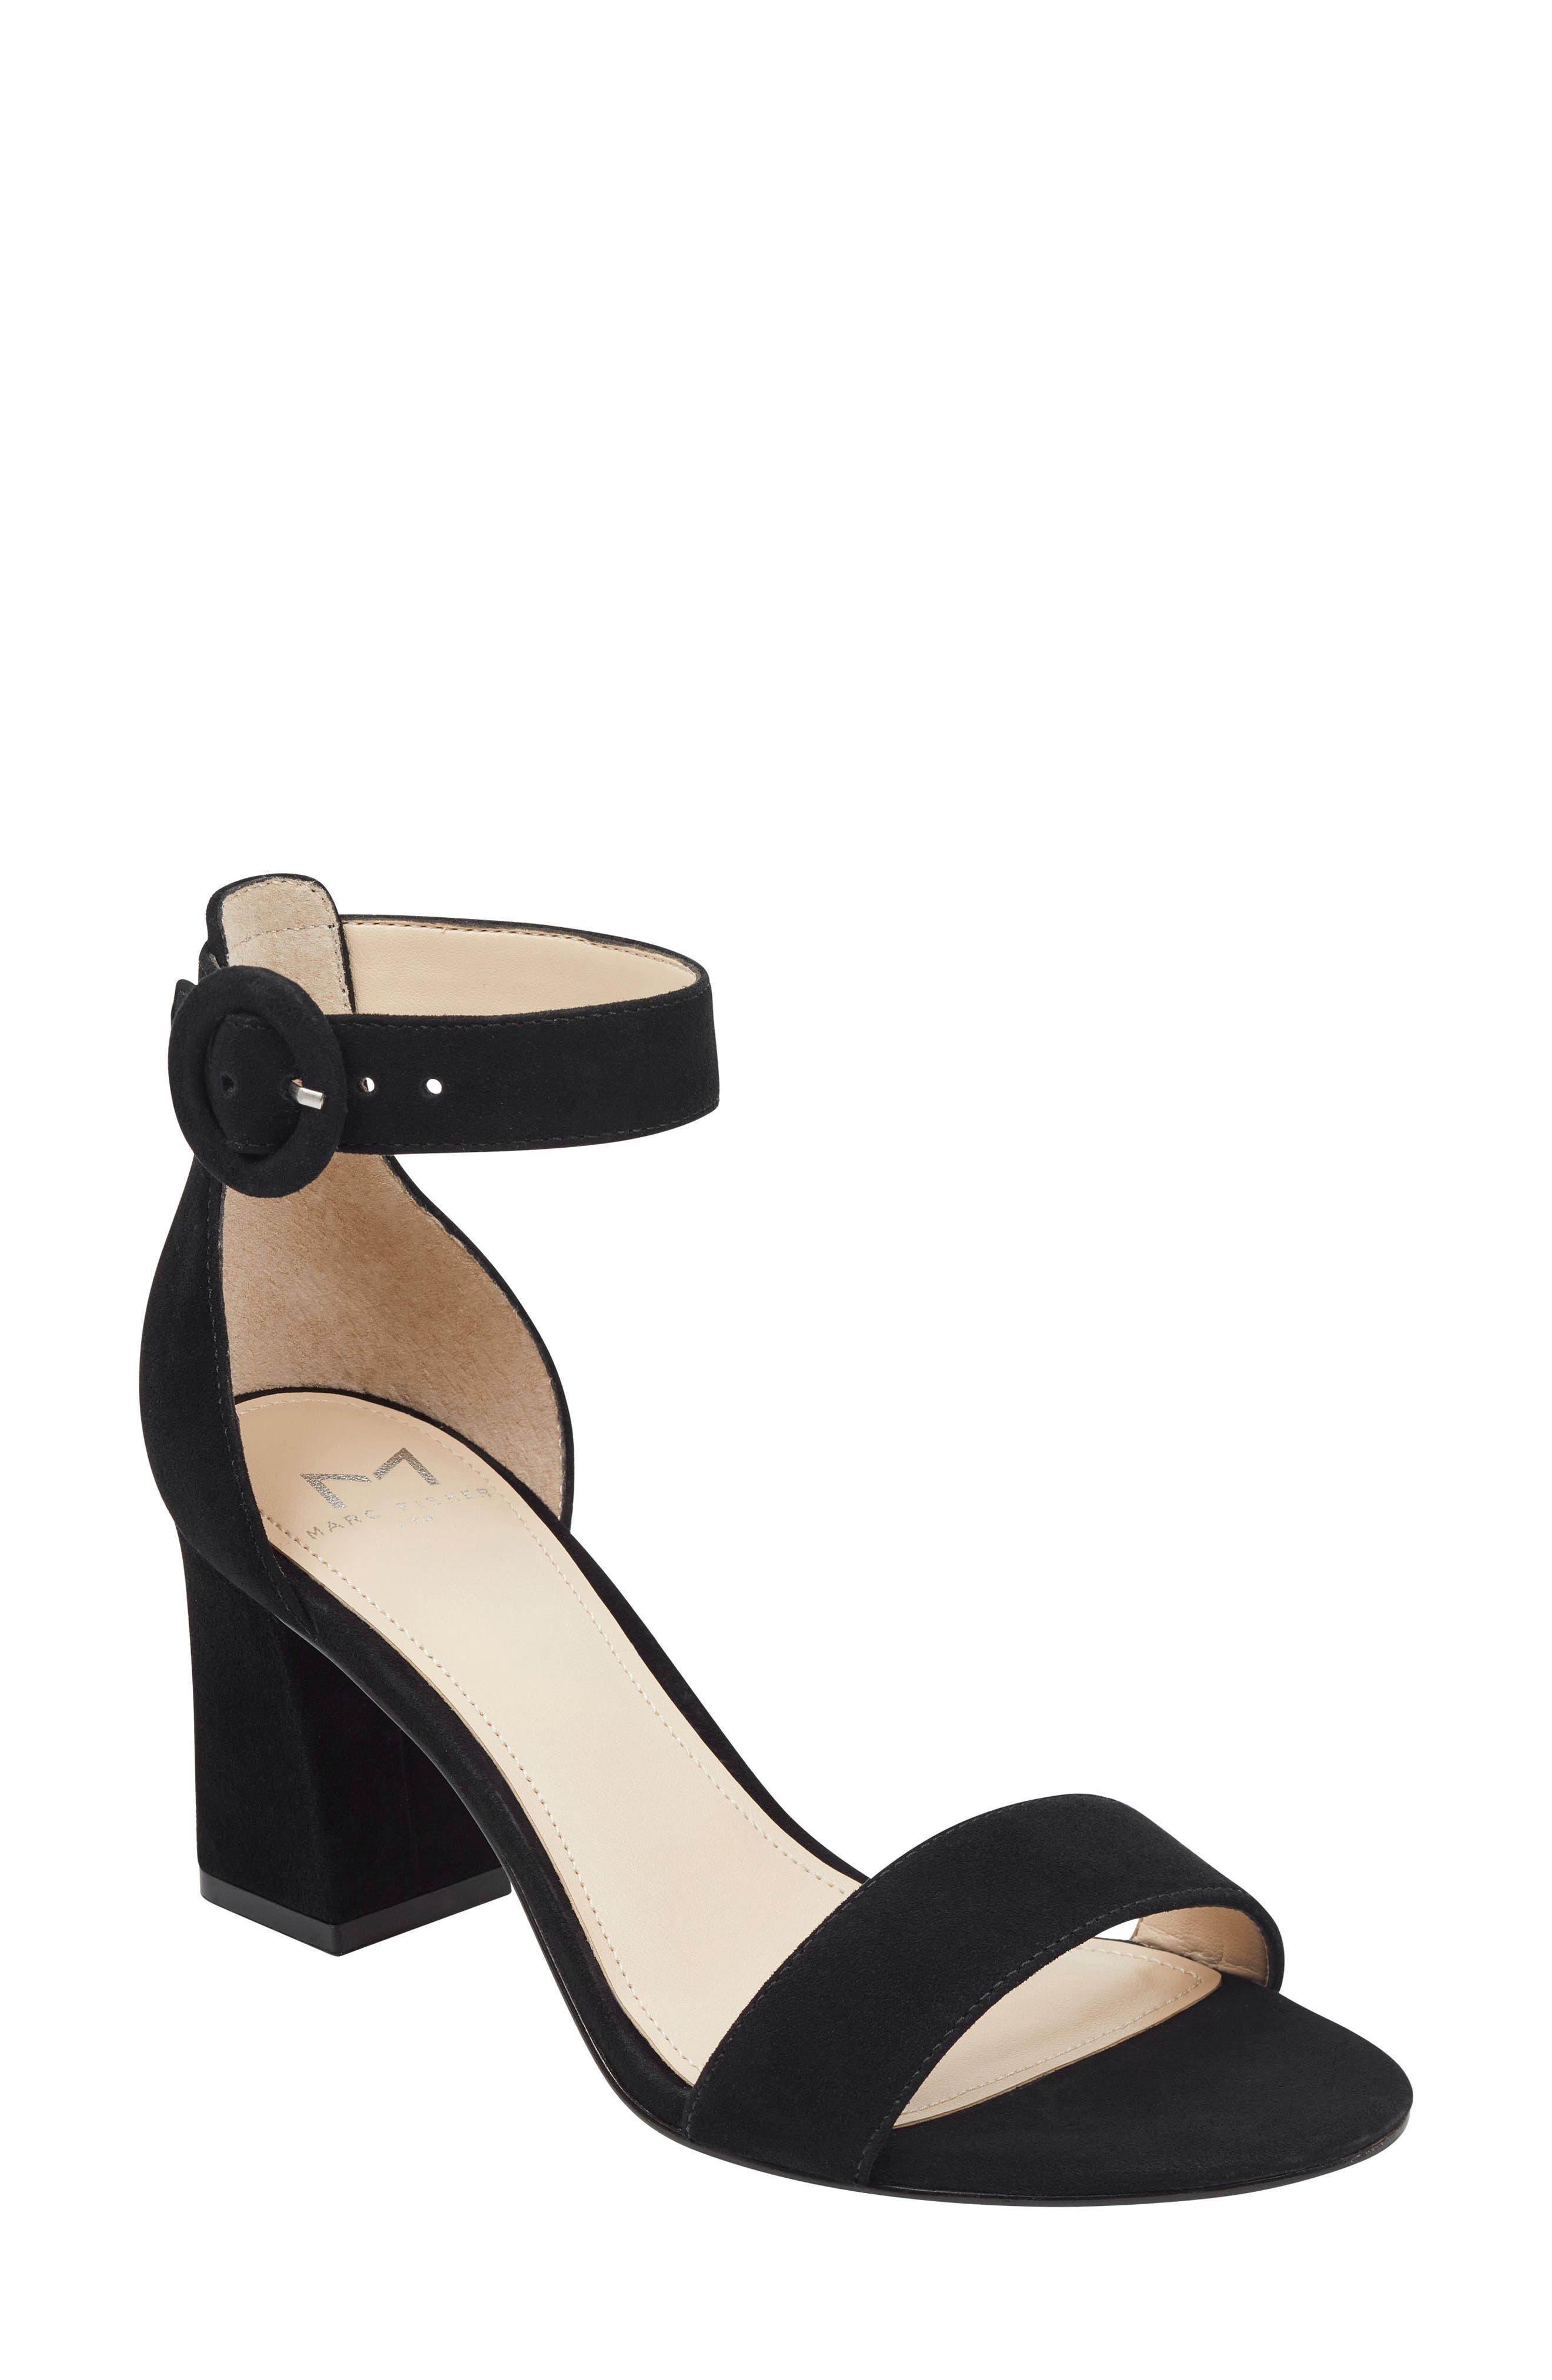 Image of Marc Fisher LTD Karlee Block Heel Sandal